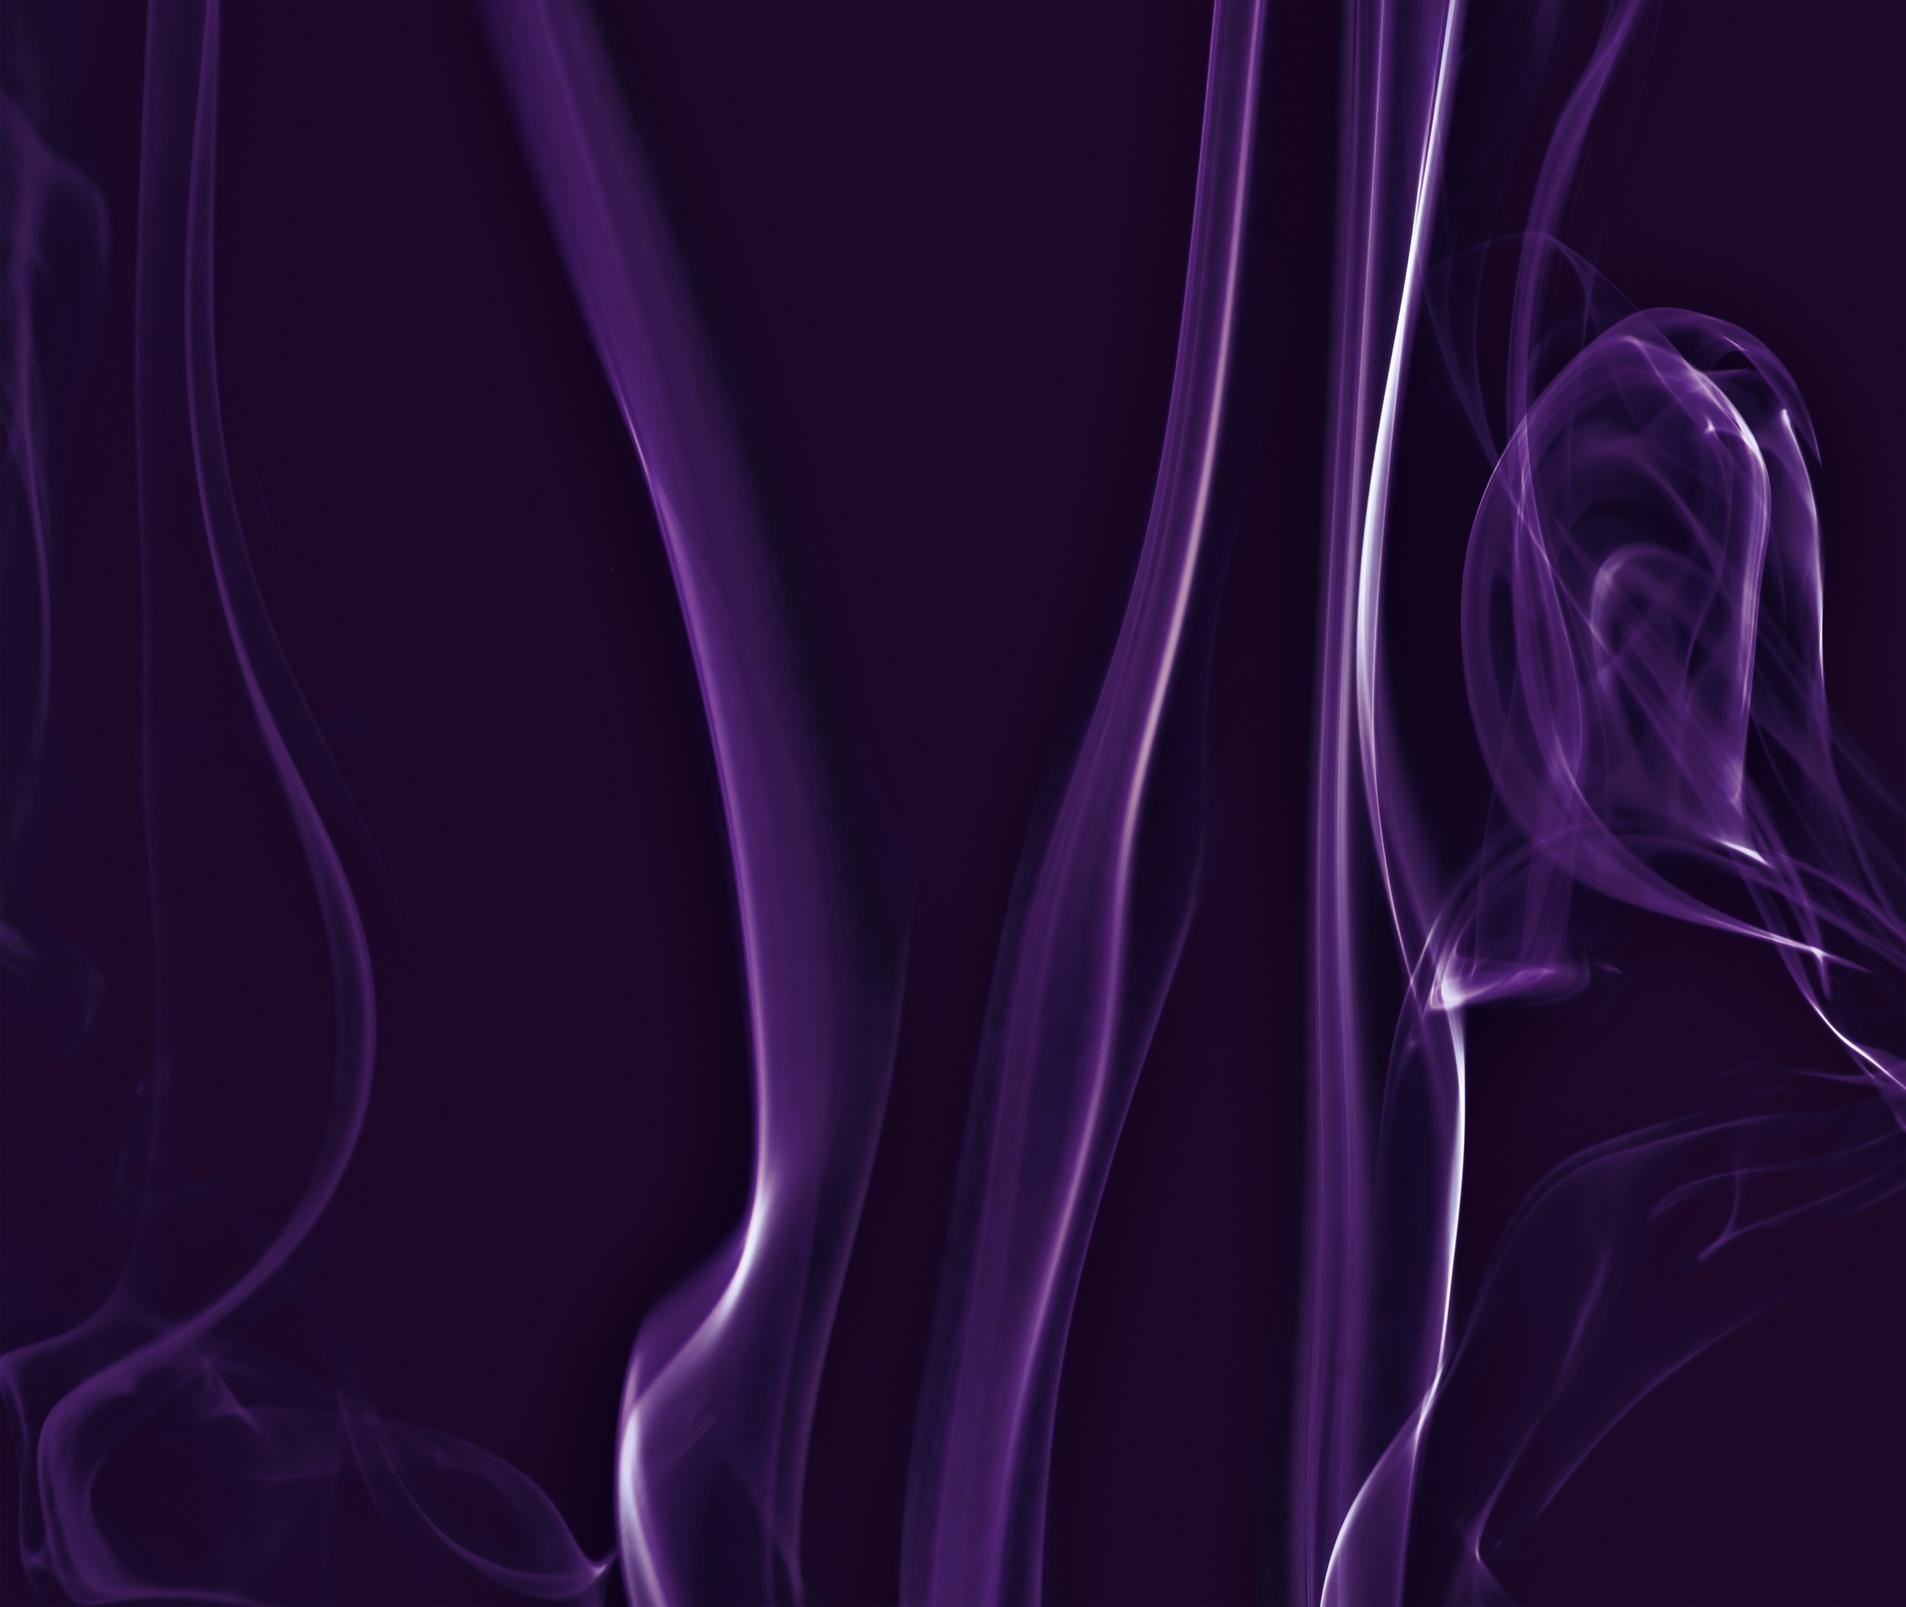 Purple smoke photo